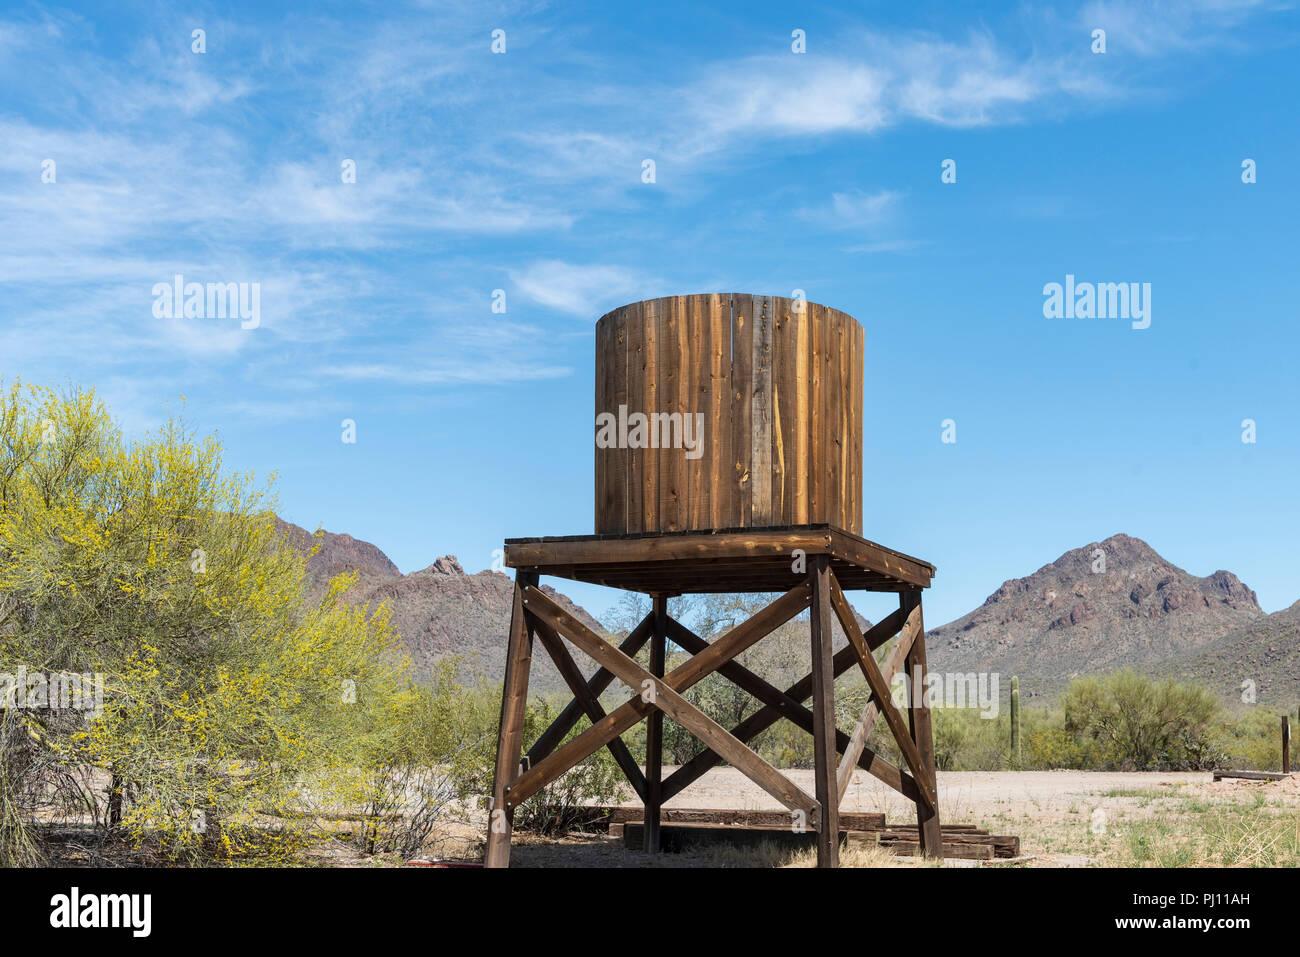 Platform Holding Water Tank Stock Photos & Platform Holding